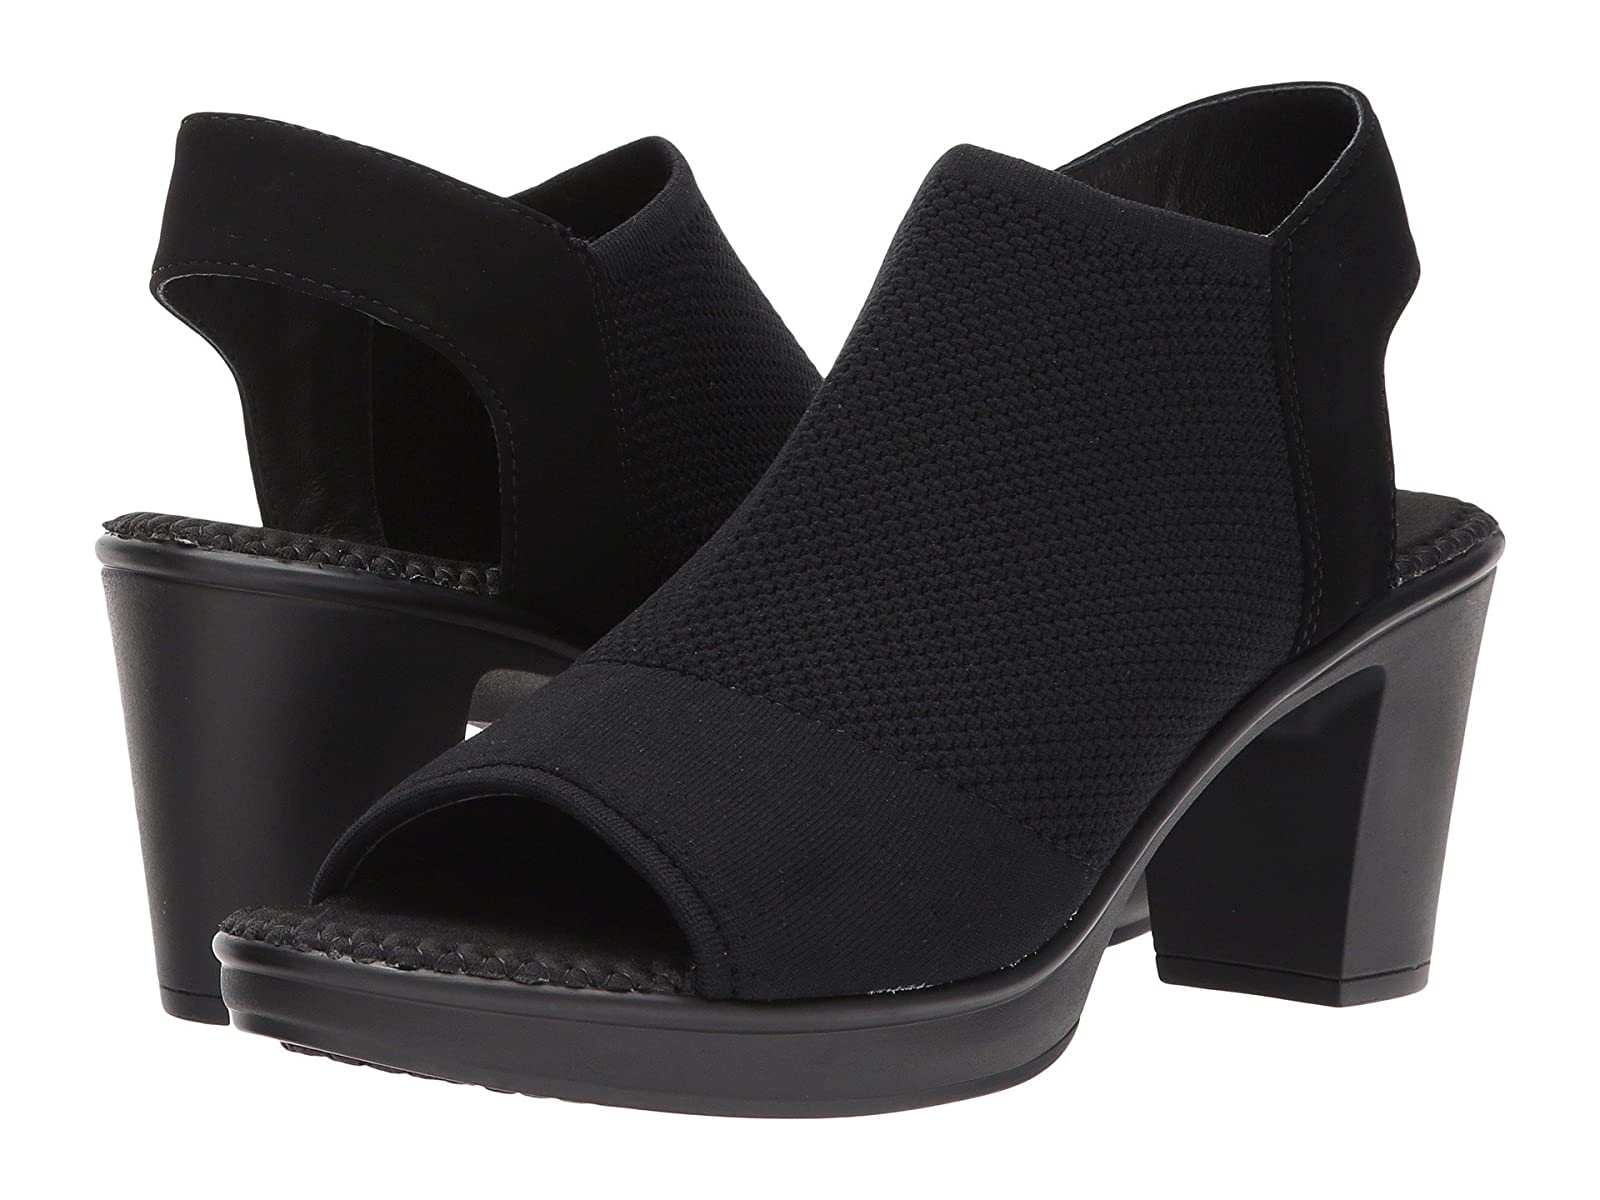 Steven NC-EnvyCheap and distinctive eye-catching shoes